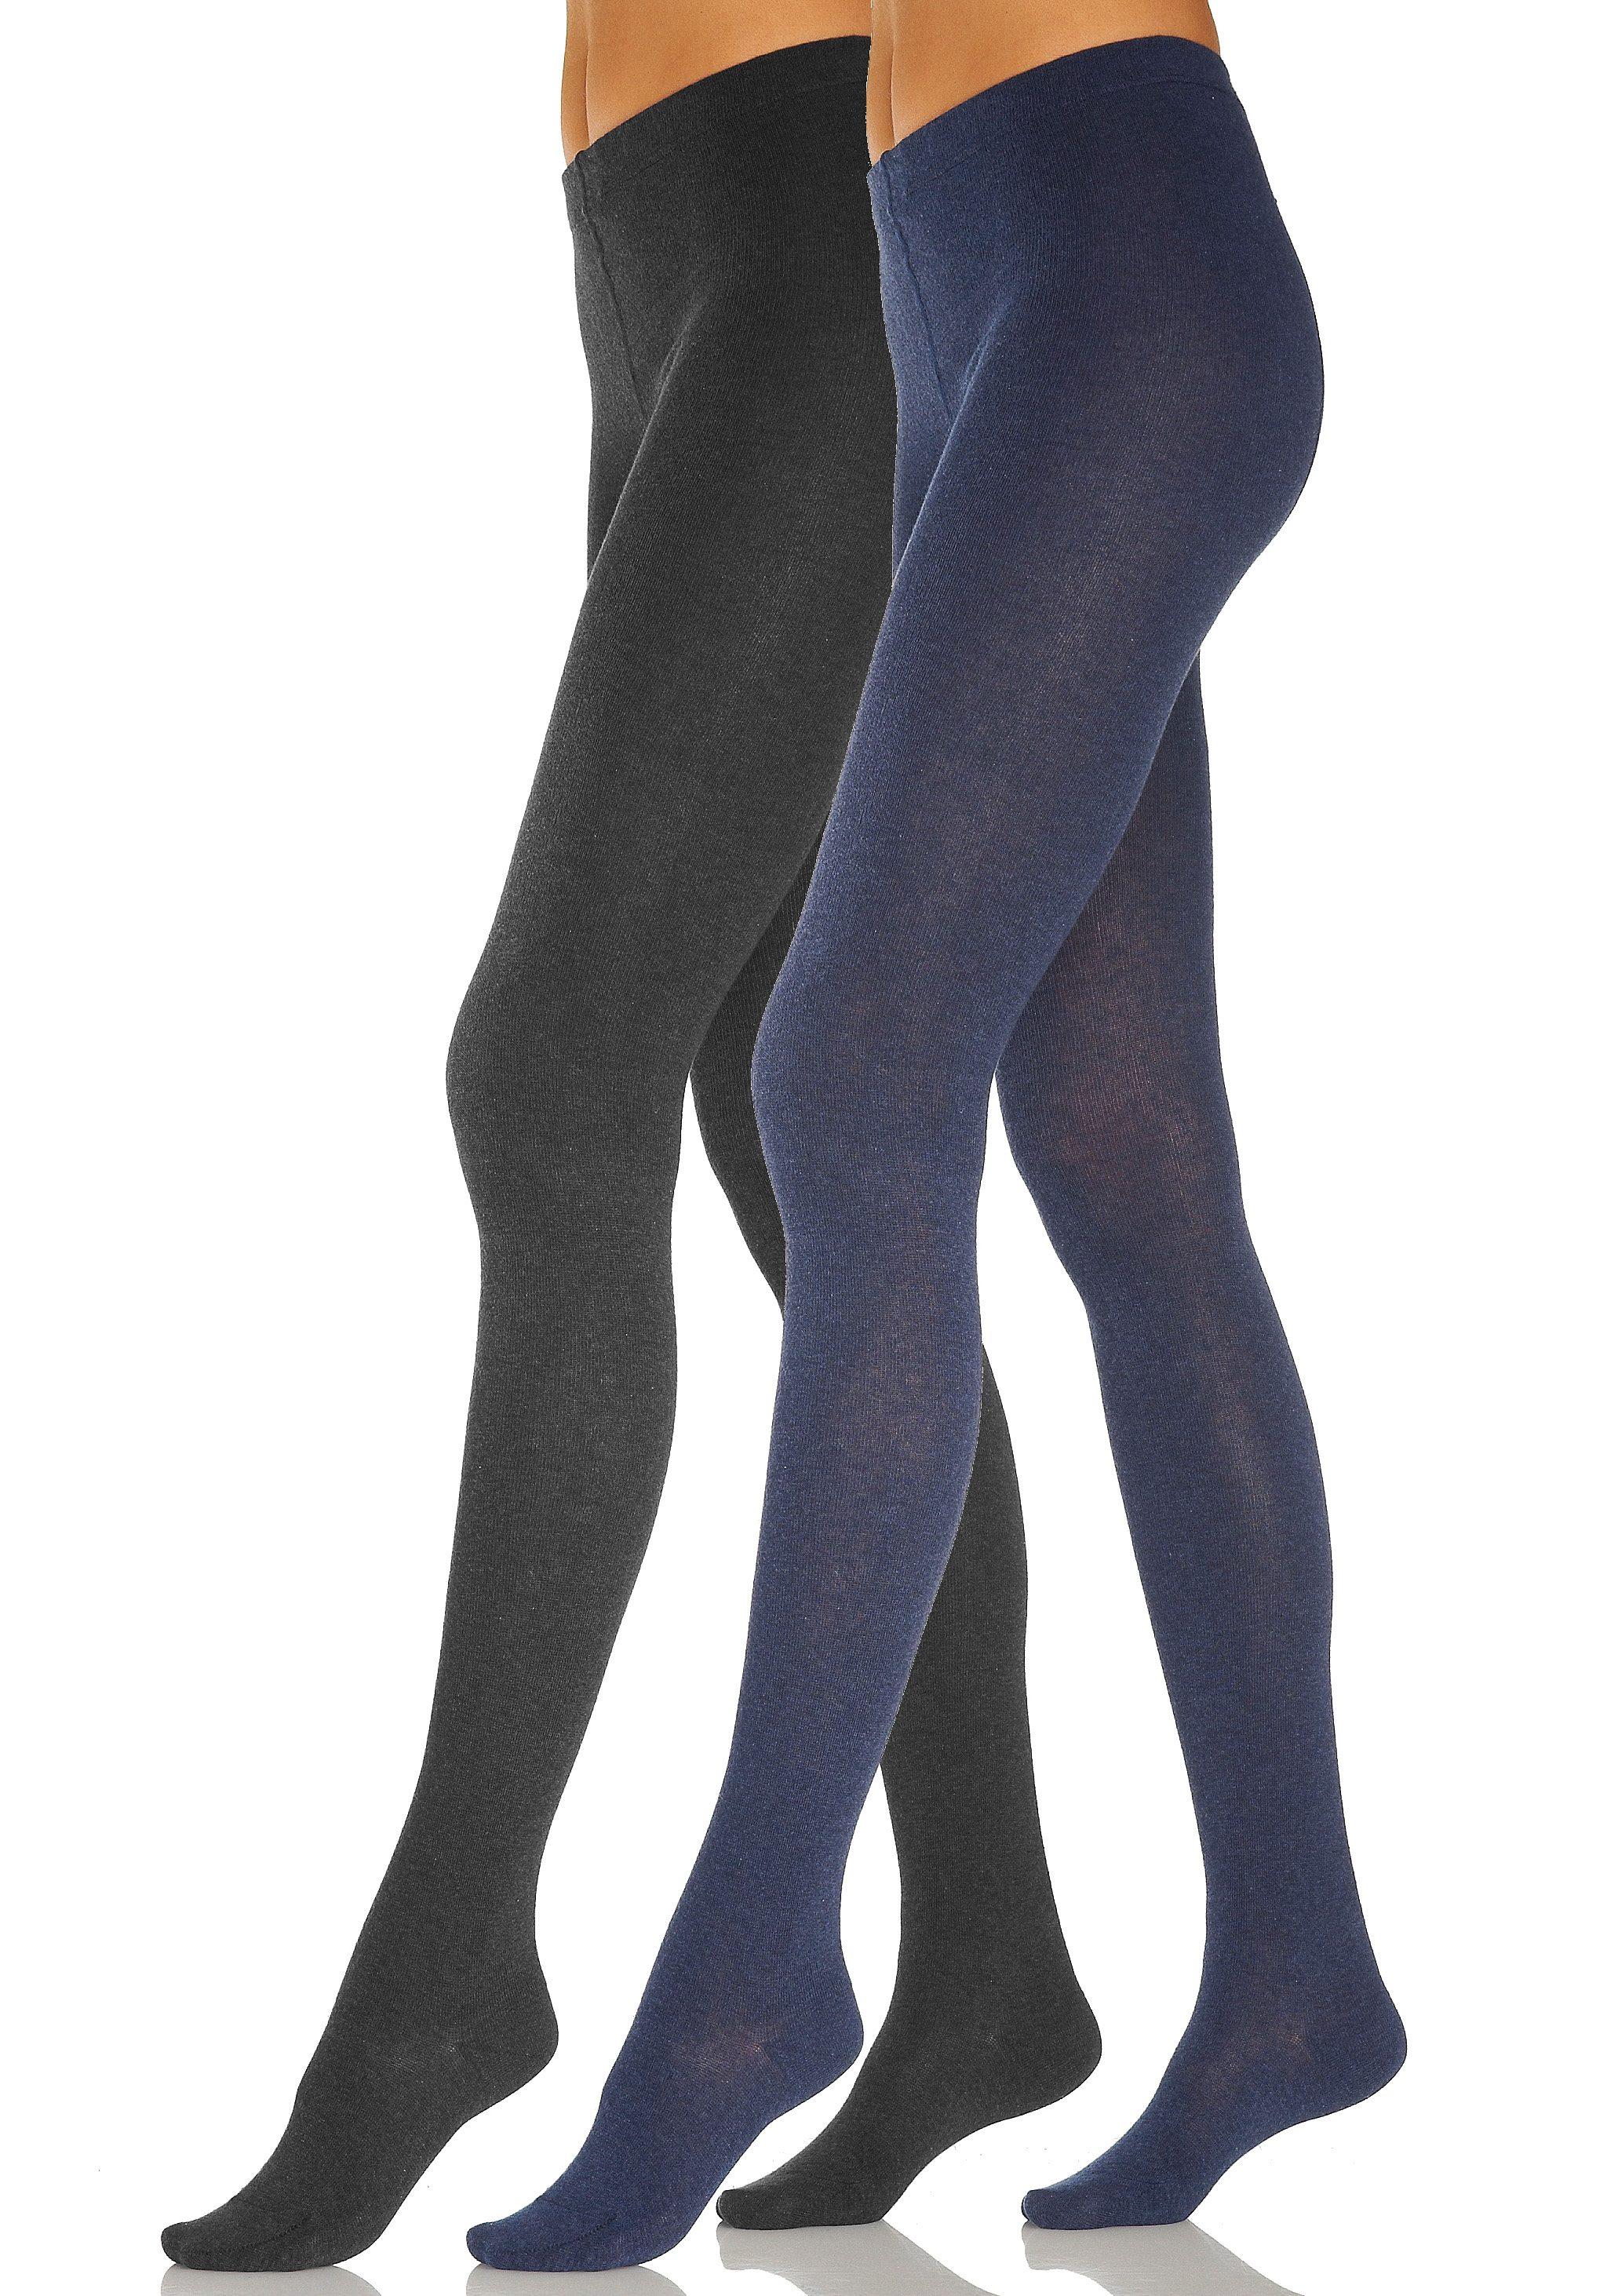 Lavana Basic Strumpfhosen (2 Paar) glatt gestrickt